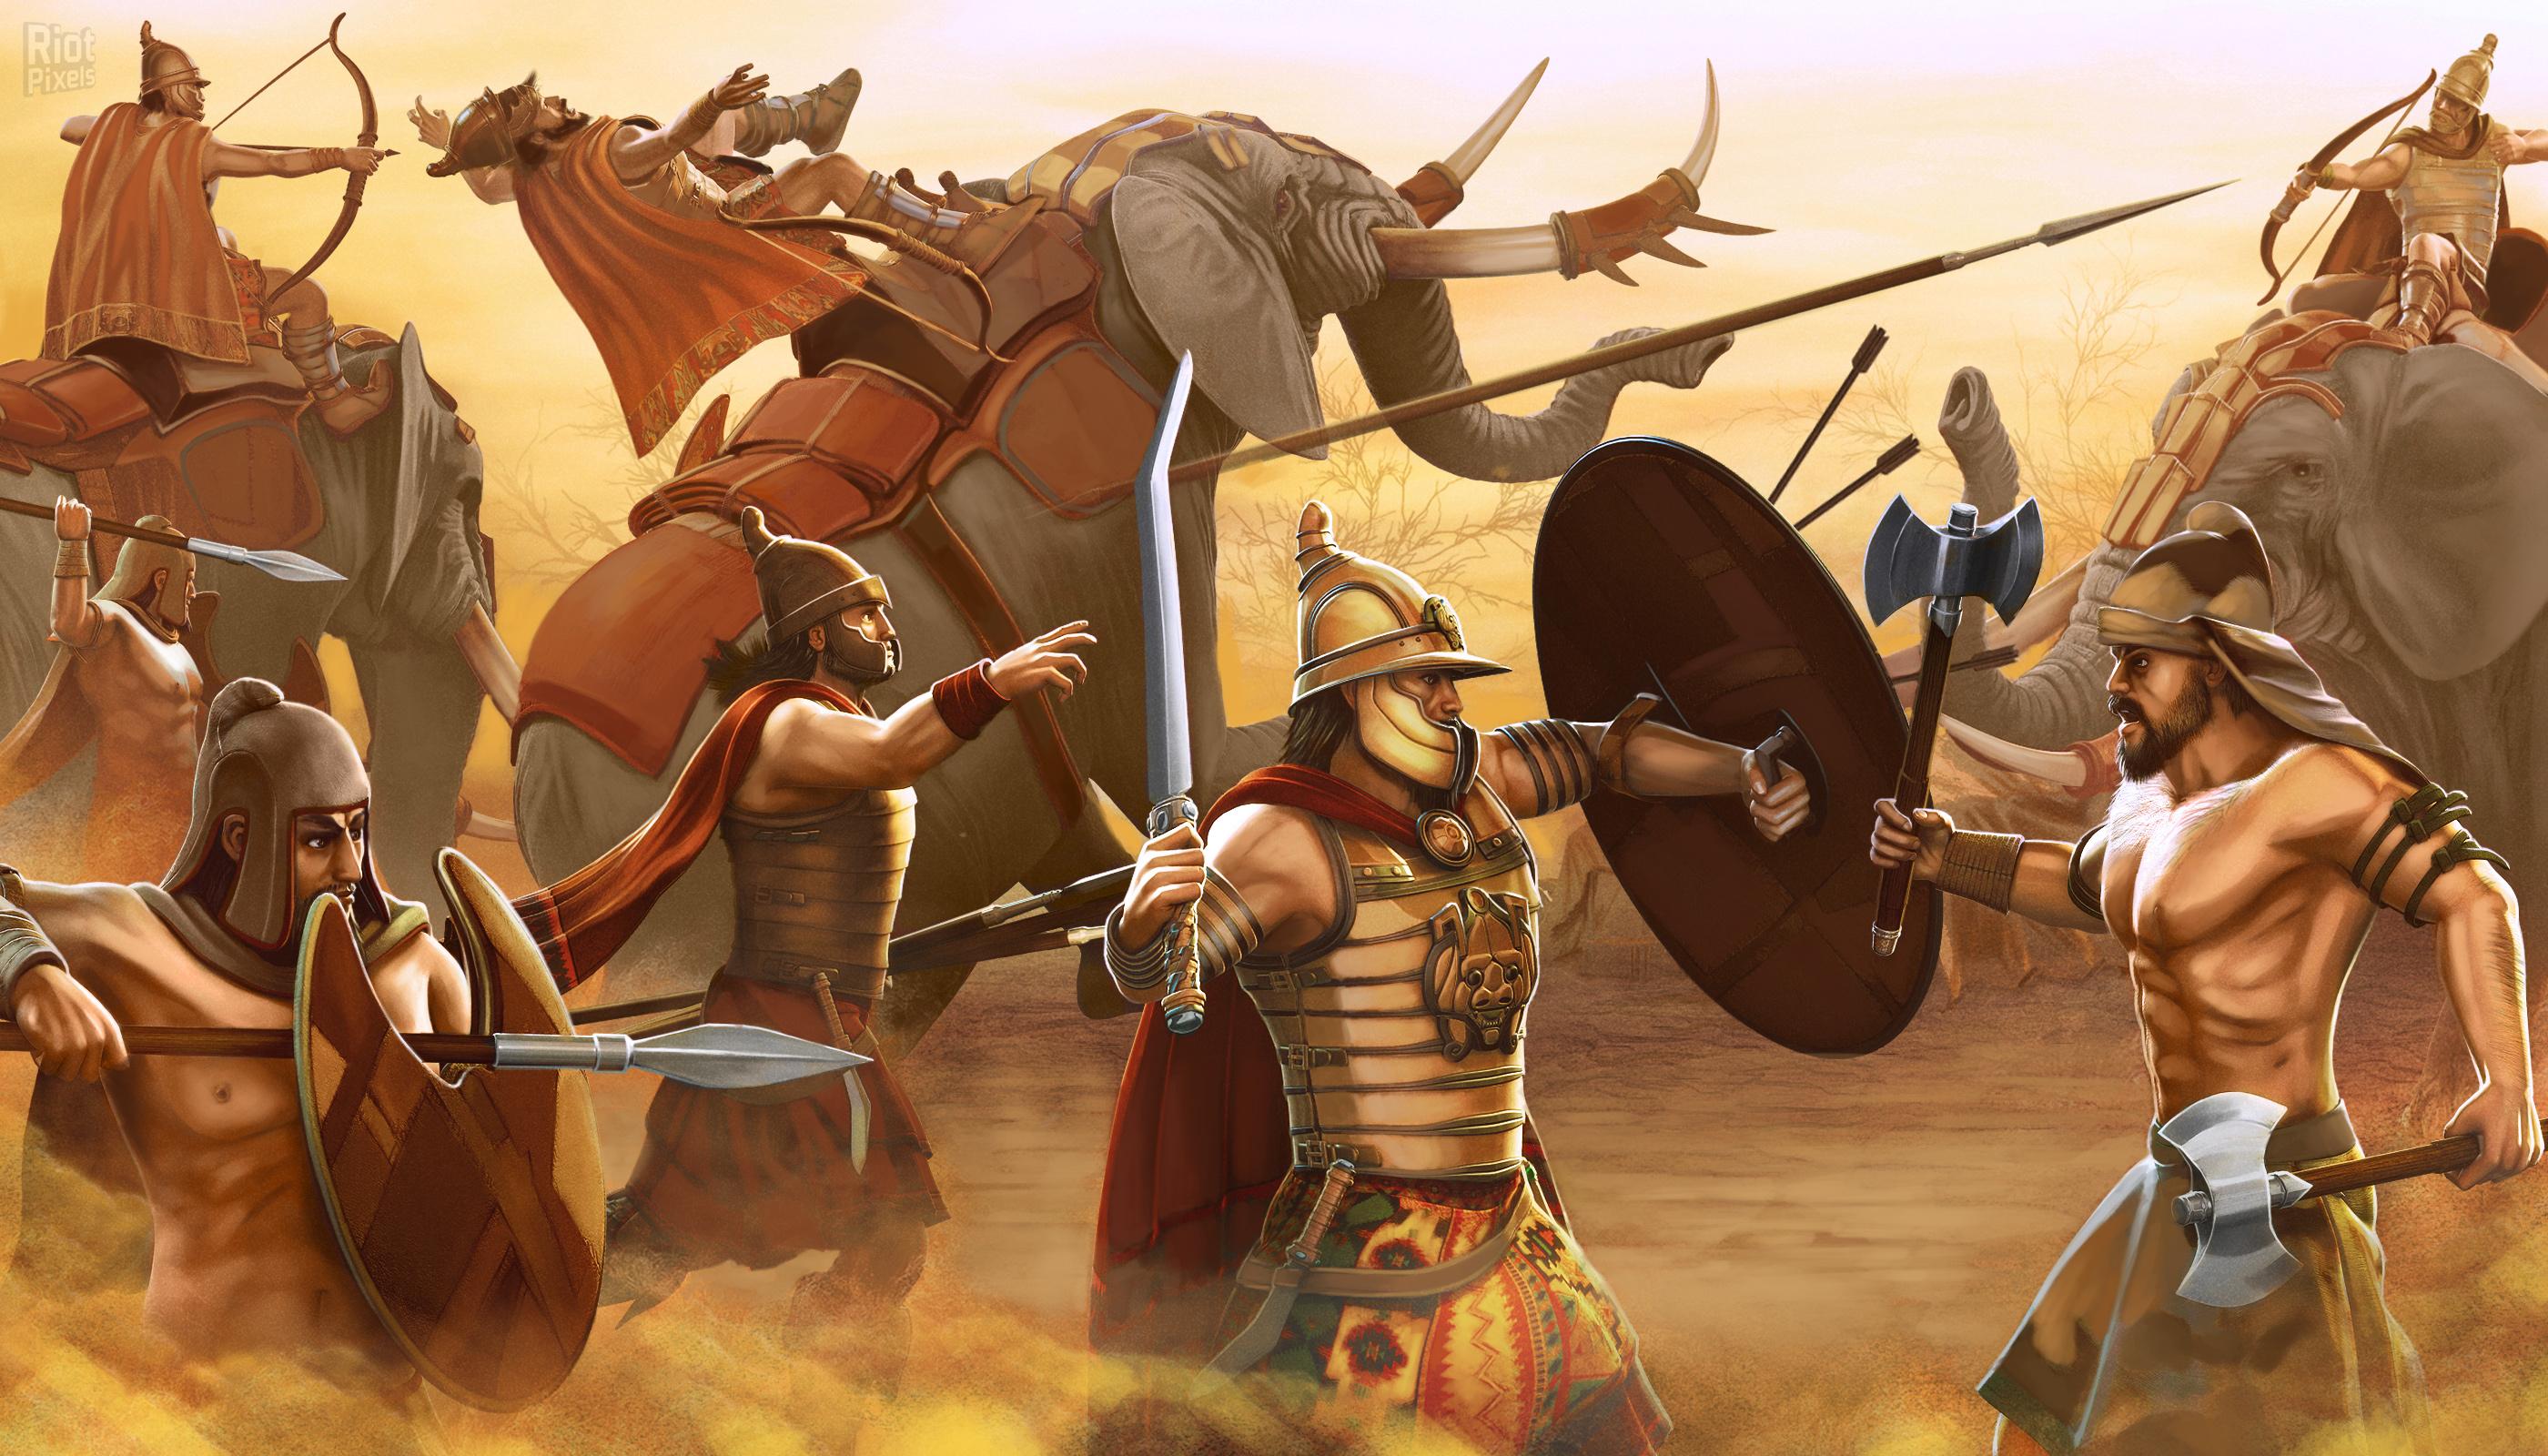 Grepolis   game wallpapers at Riot Pixels images 2800x1600